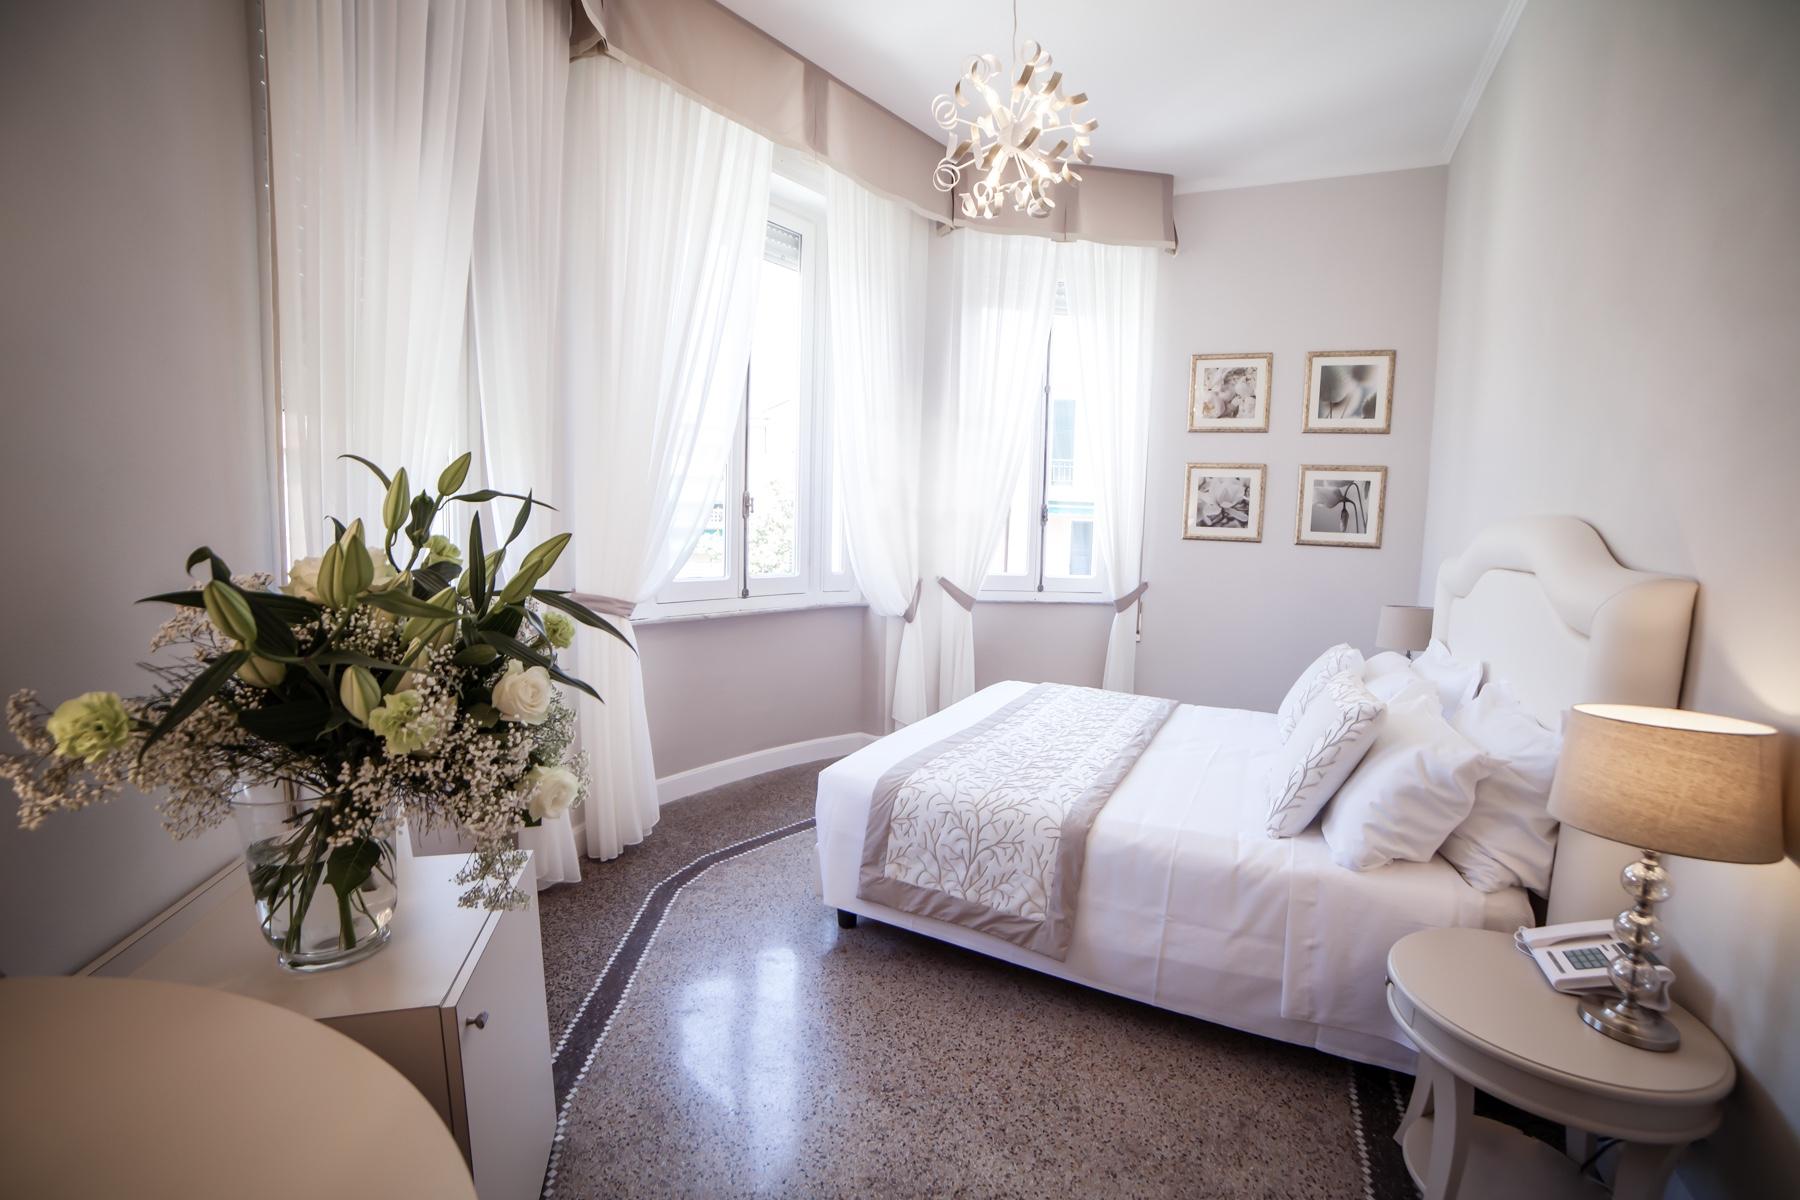 style-shiver-travel-ligurien-italien-19